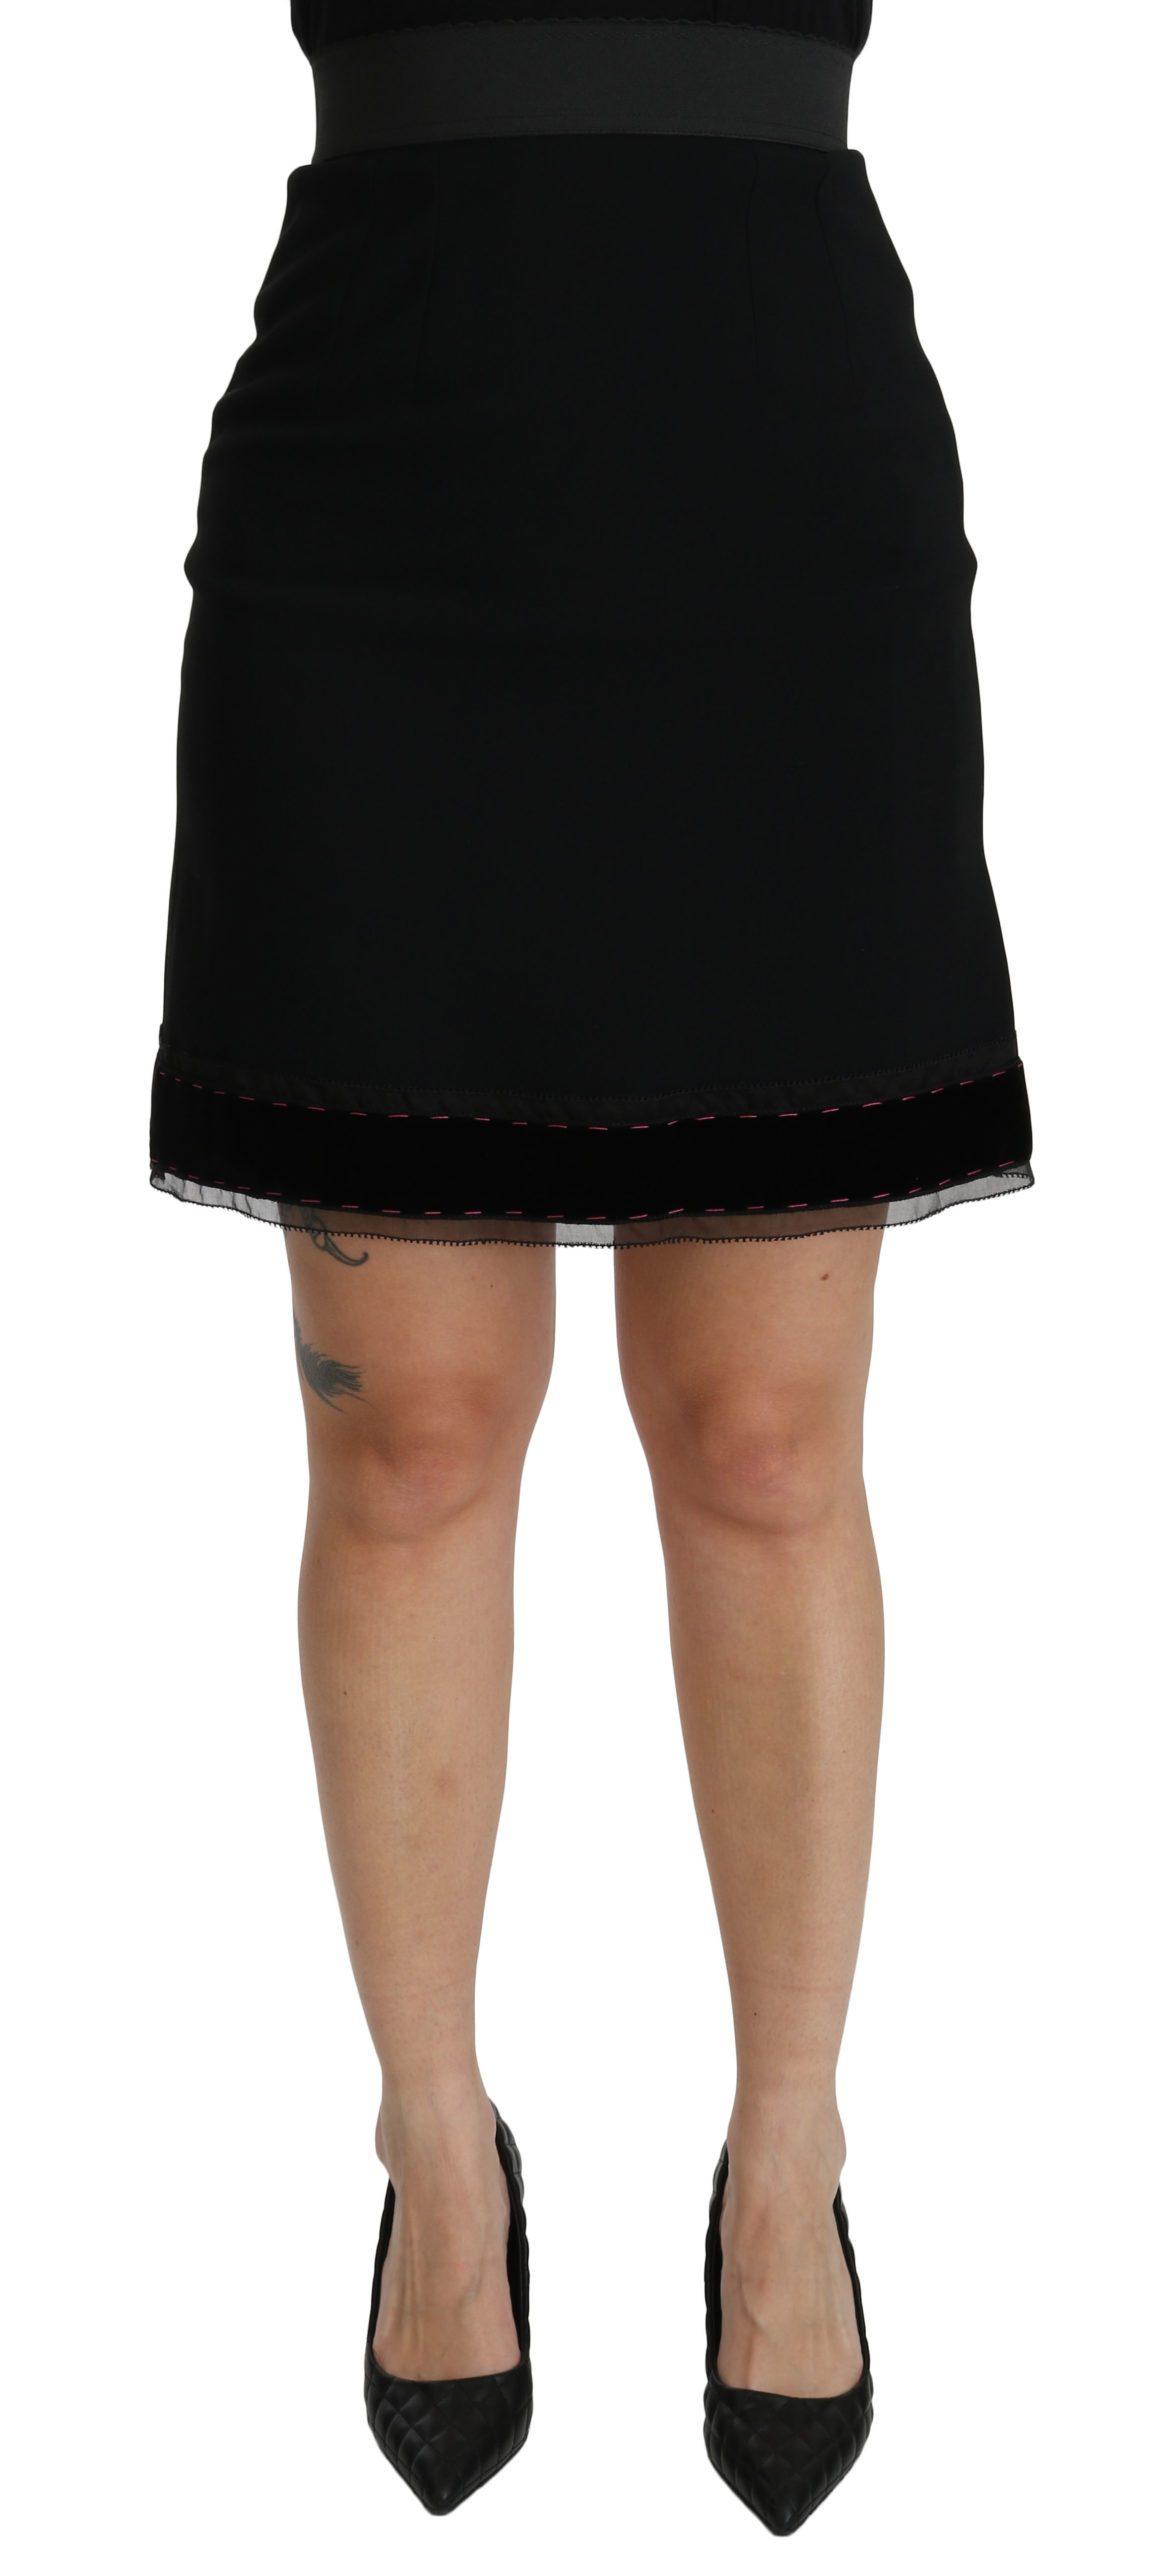 Dolce & Gabbana Women's A-line High Waist Mini Skirt Black SKI1389 - IT38|XS